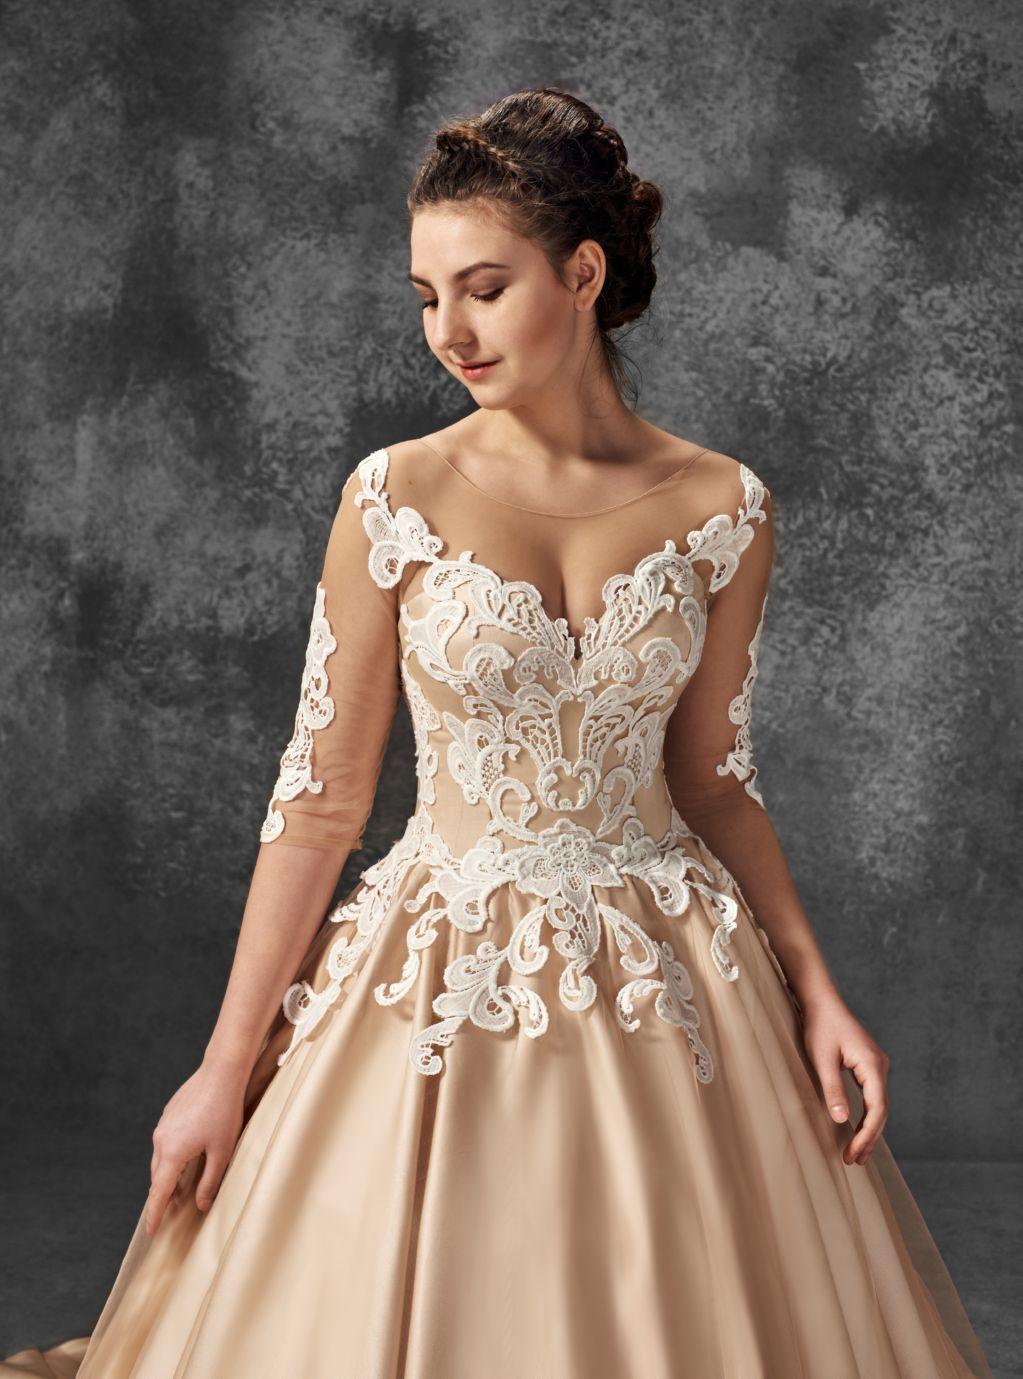 Blush wedding dress with sleeves  Wedding Dress Vivian Nude Blush wedding dress  Lace Wedding Dress